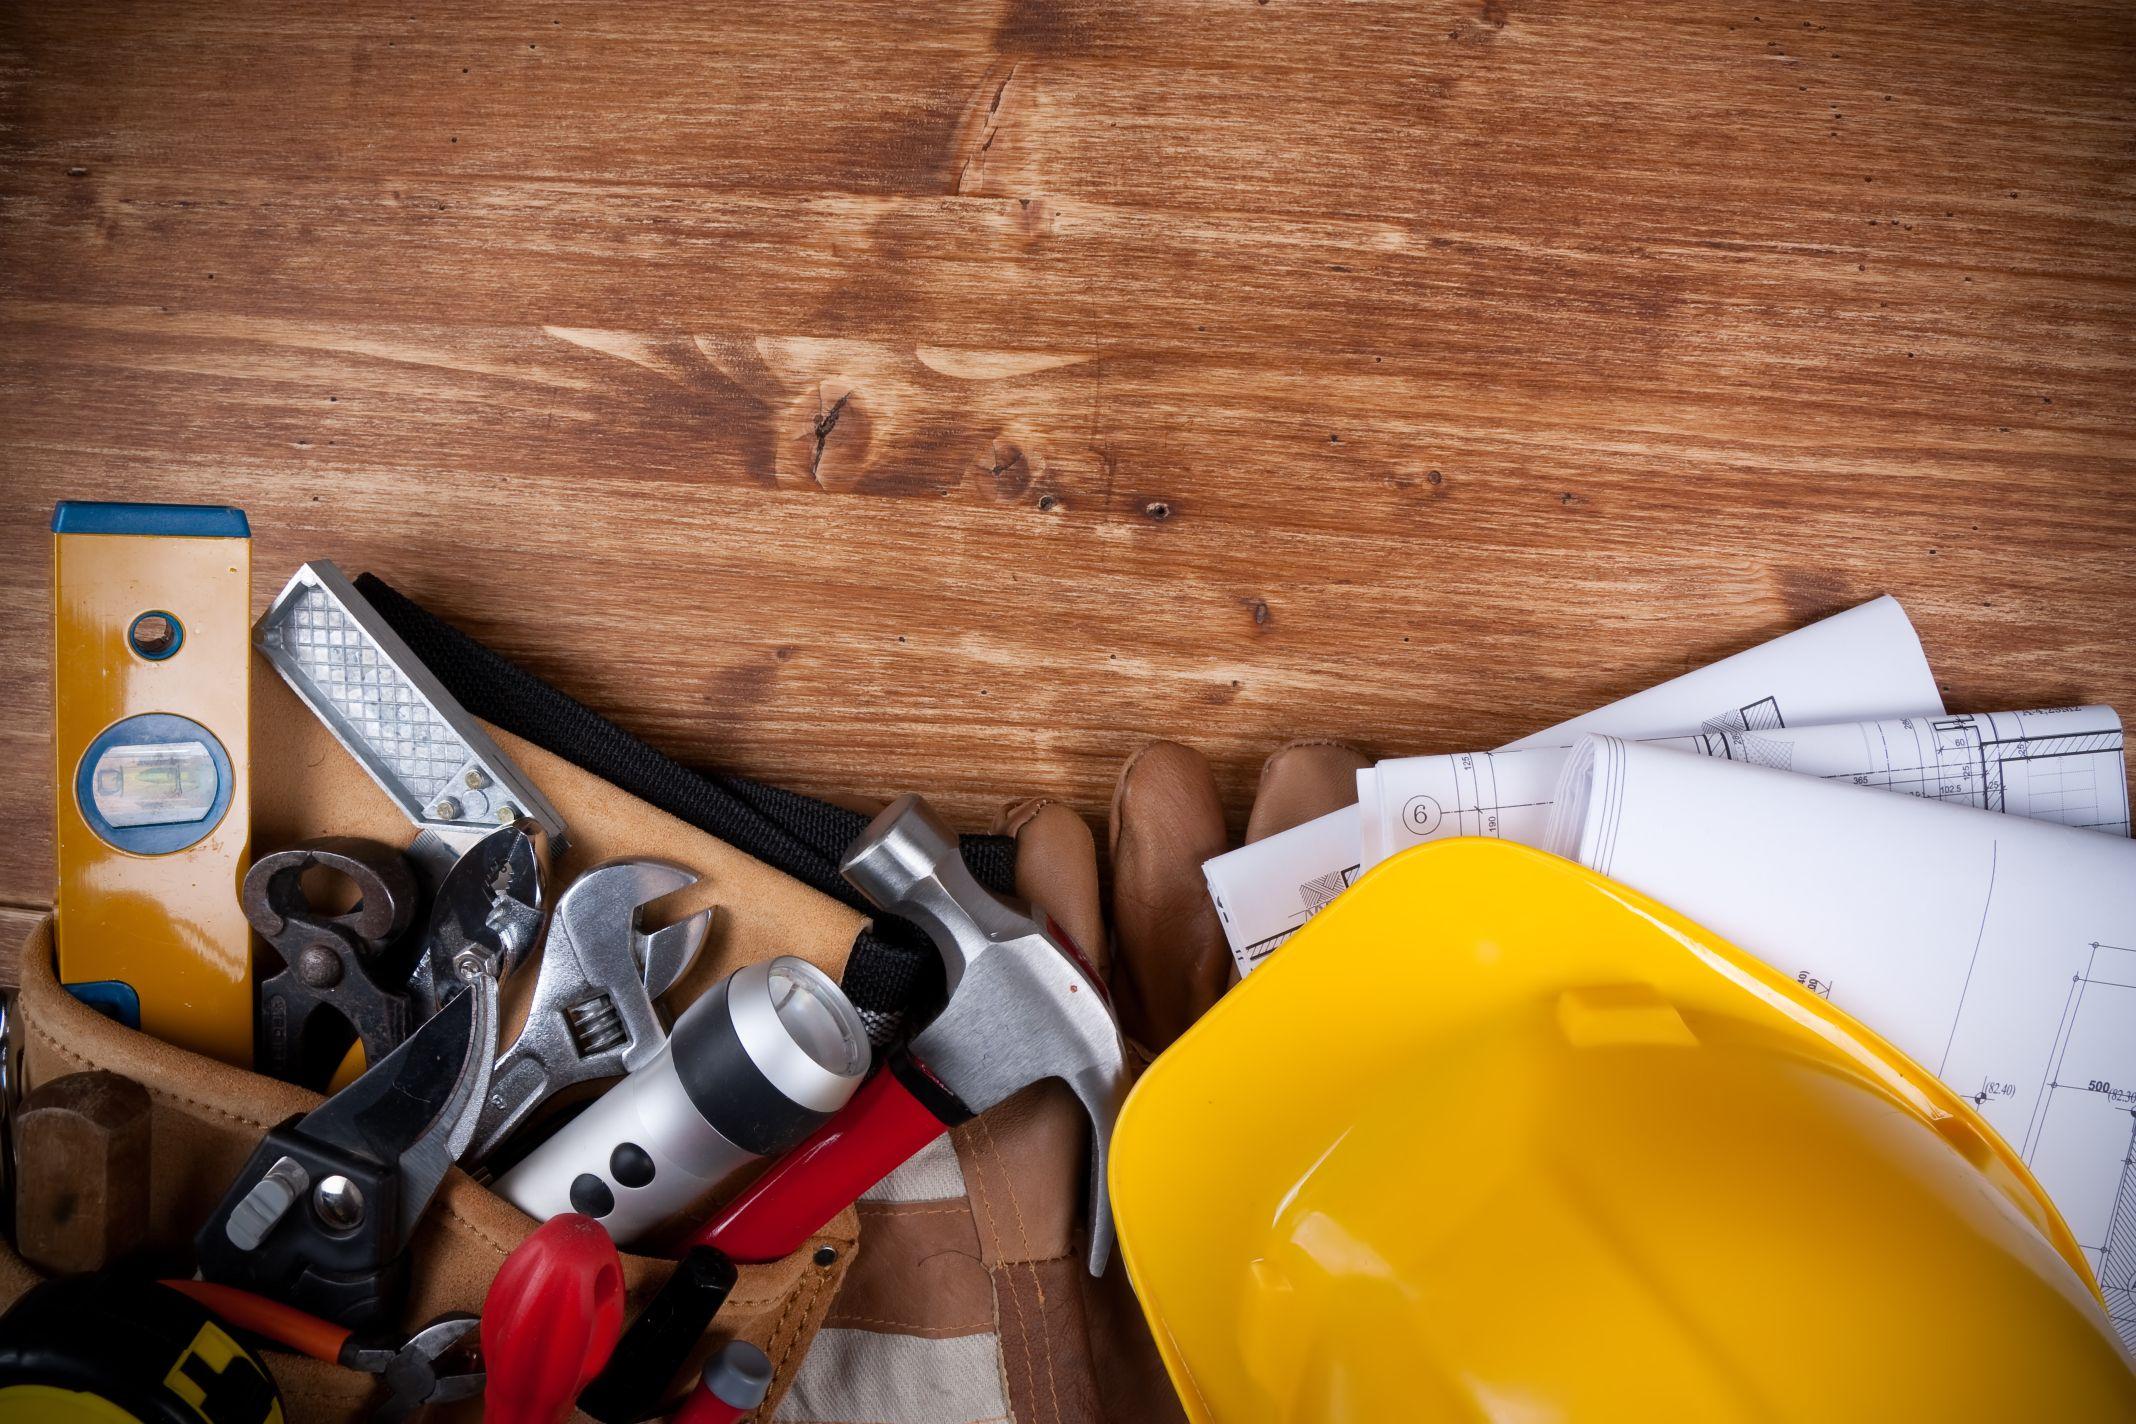 Contractors Equipment & Supplies - Dealers & Services